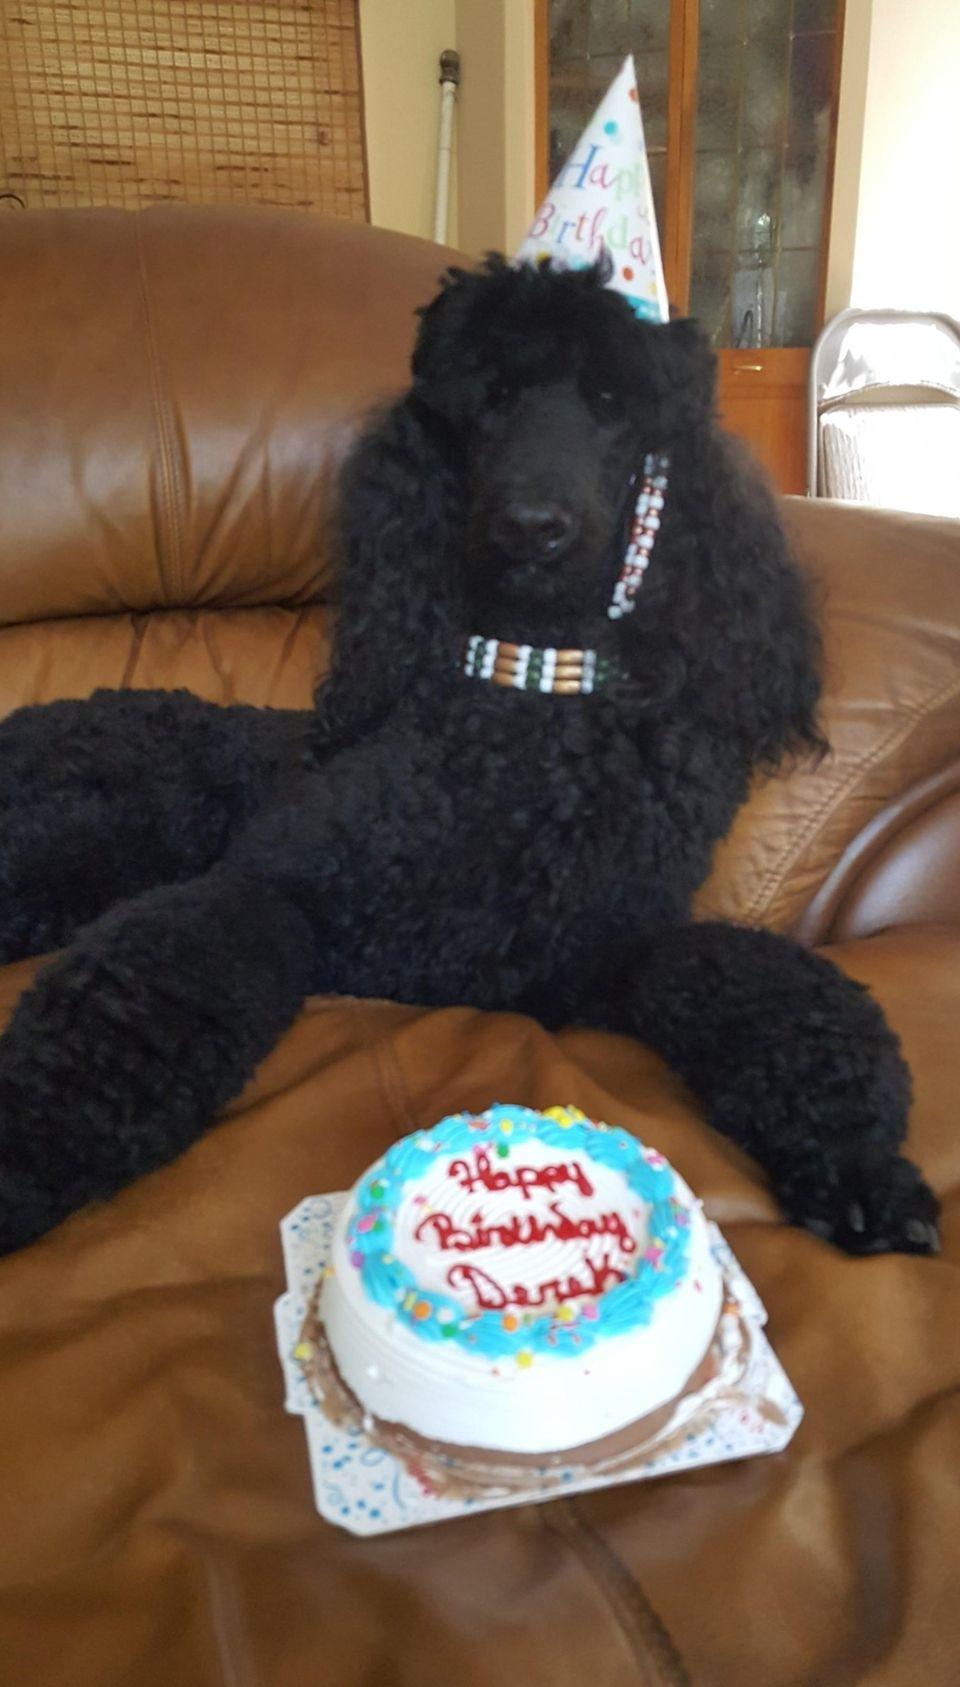 Derek McDreamy celebrating his 2nd birthday!